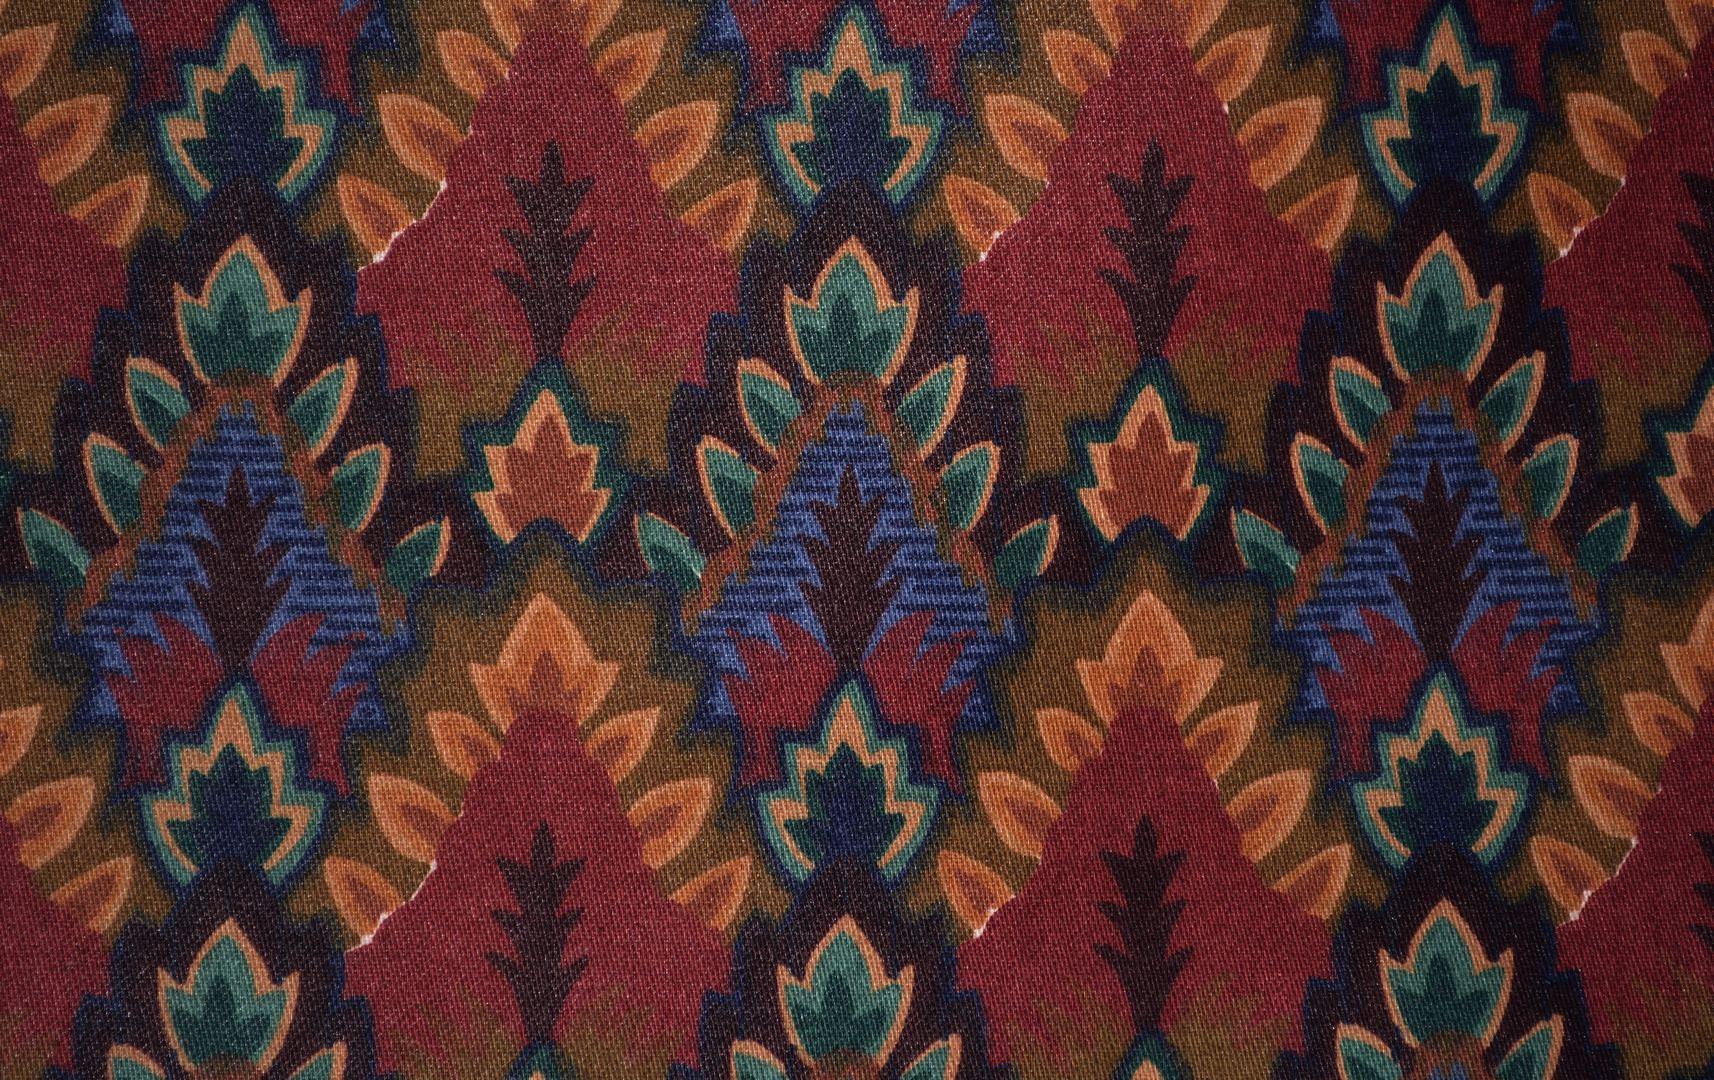 Vintage Upholstery Fabric Waverly Usa Seamless Repeat Desert